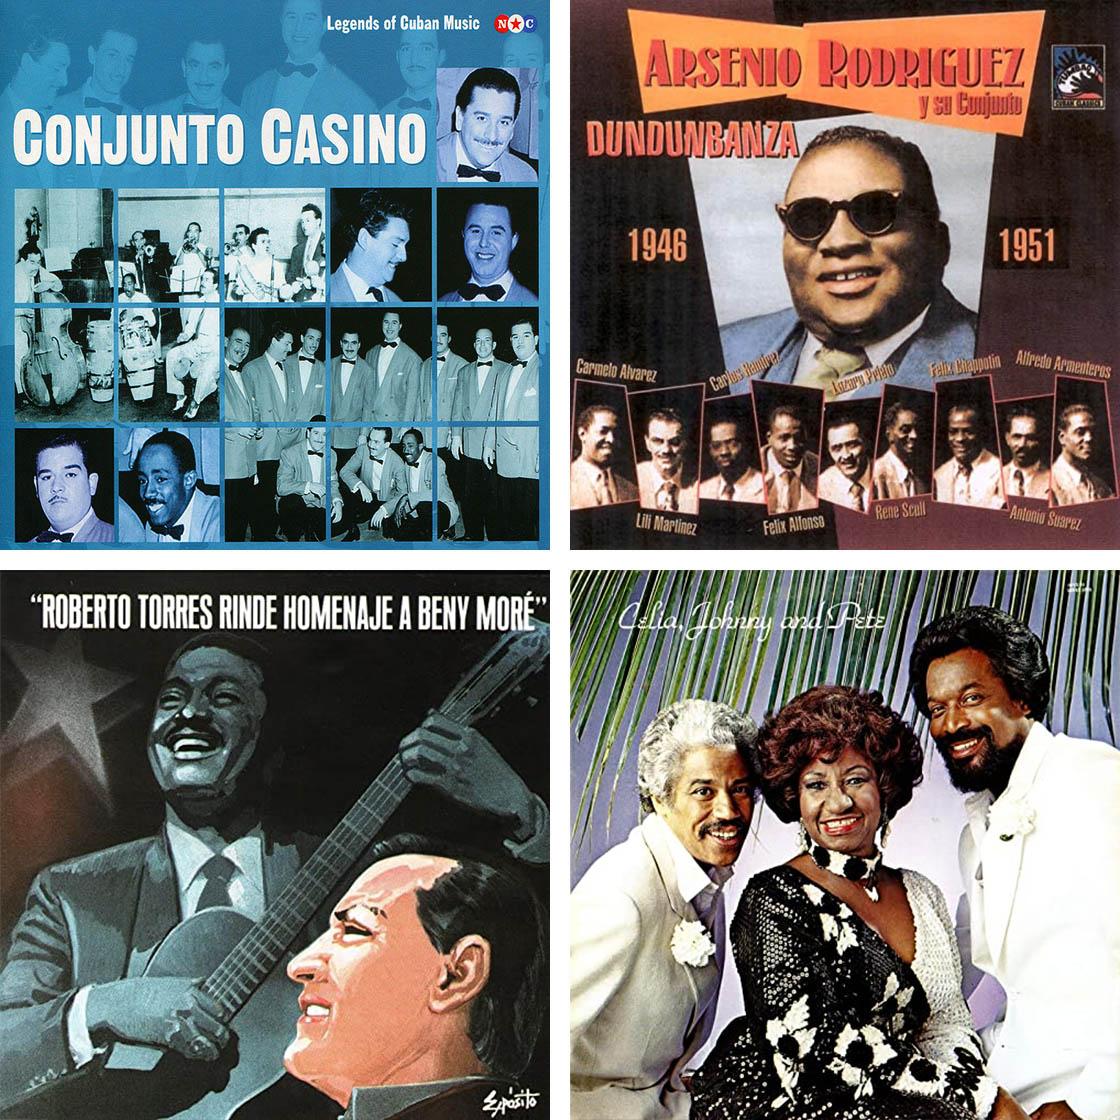 Conjunto Casino, Arsenio Rodriguez, Roberto Torres, Johnny Pacheco